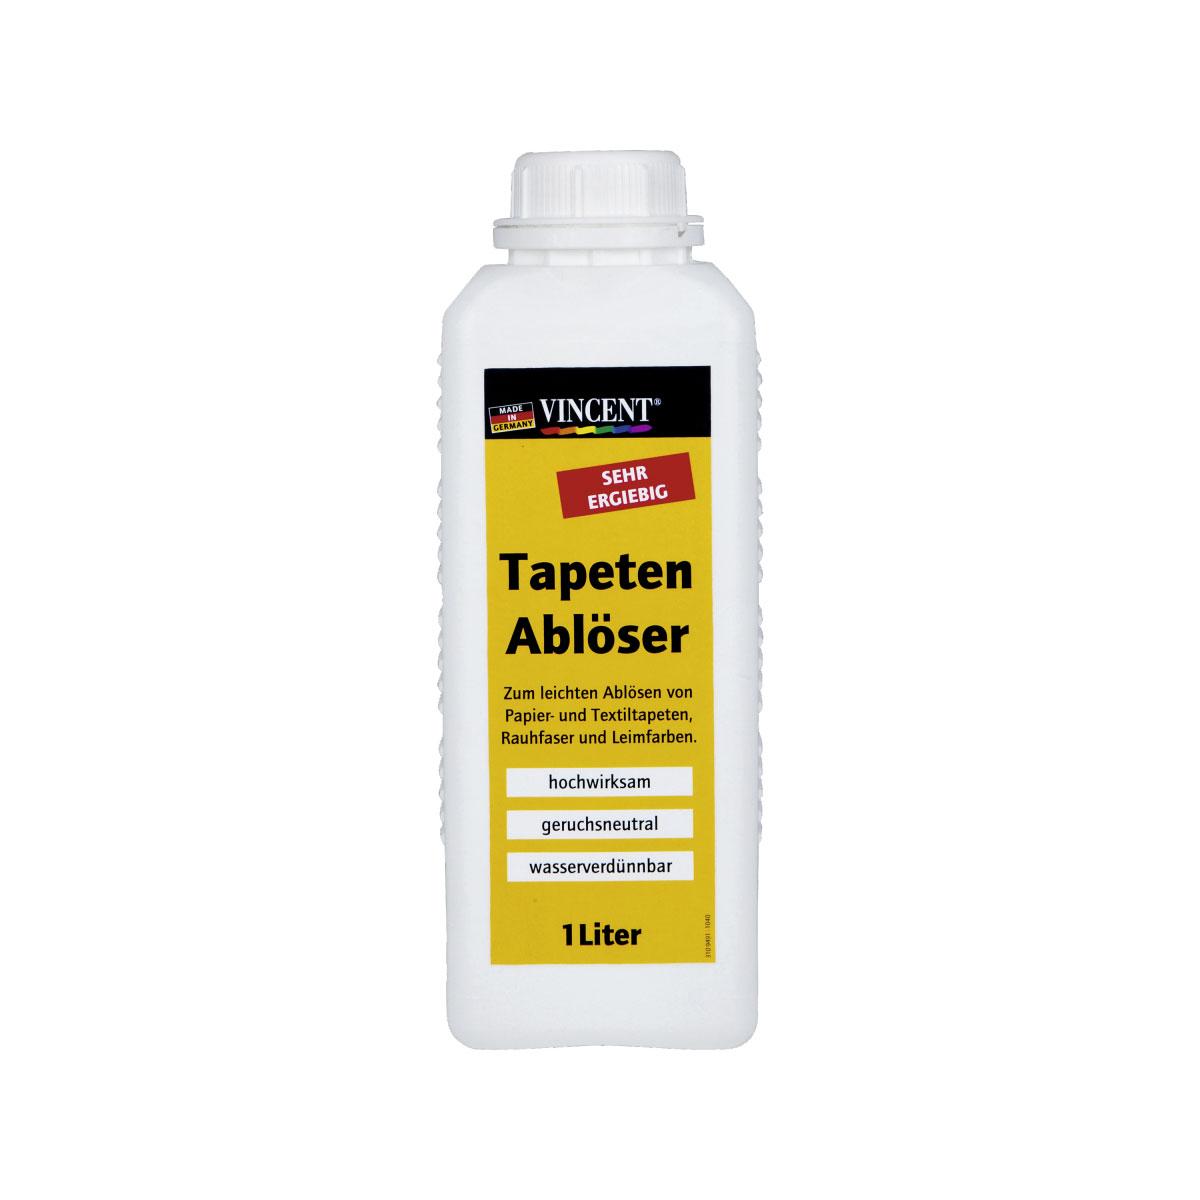 Vincent Tapetenablöser